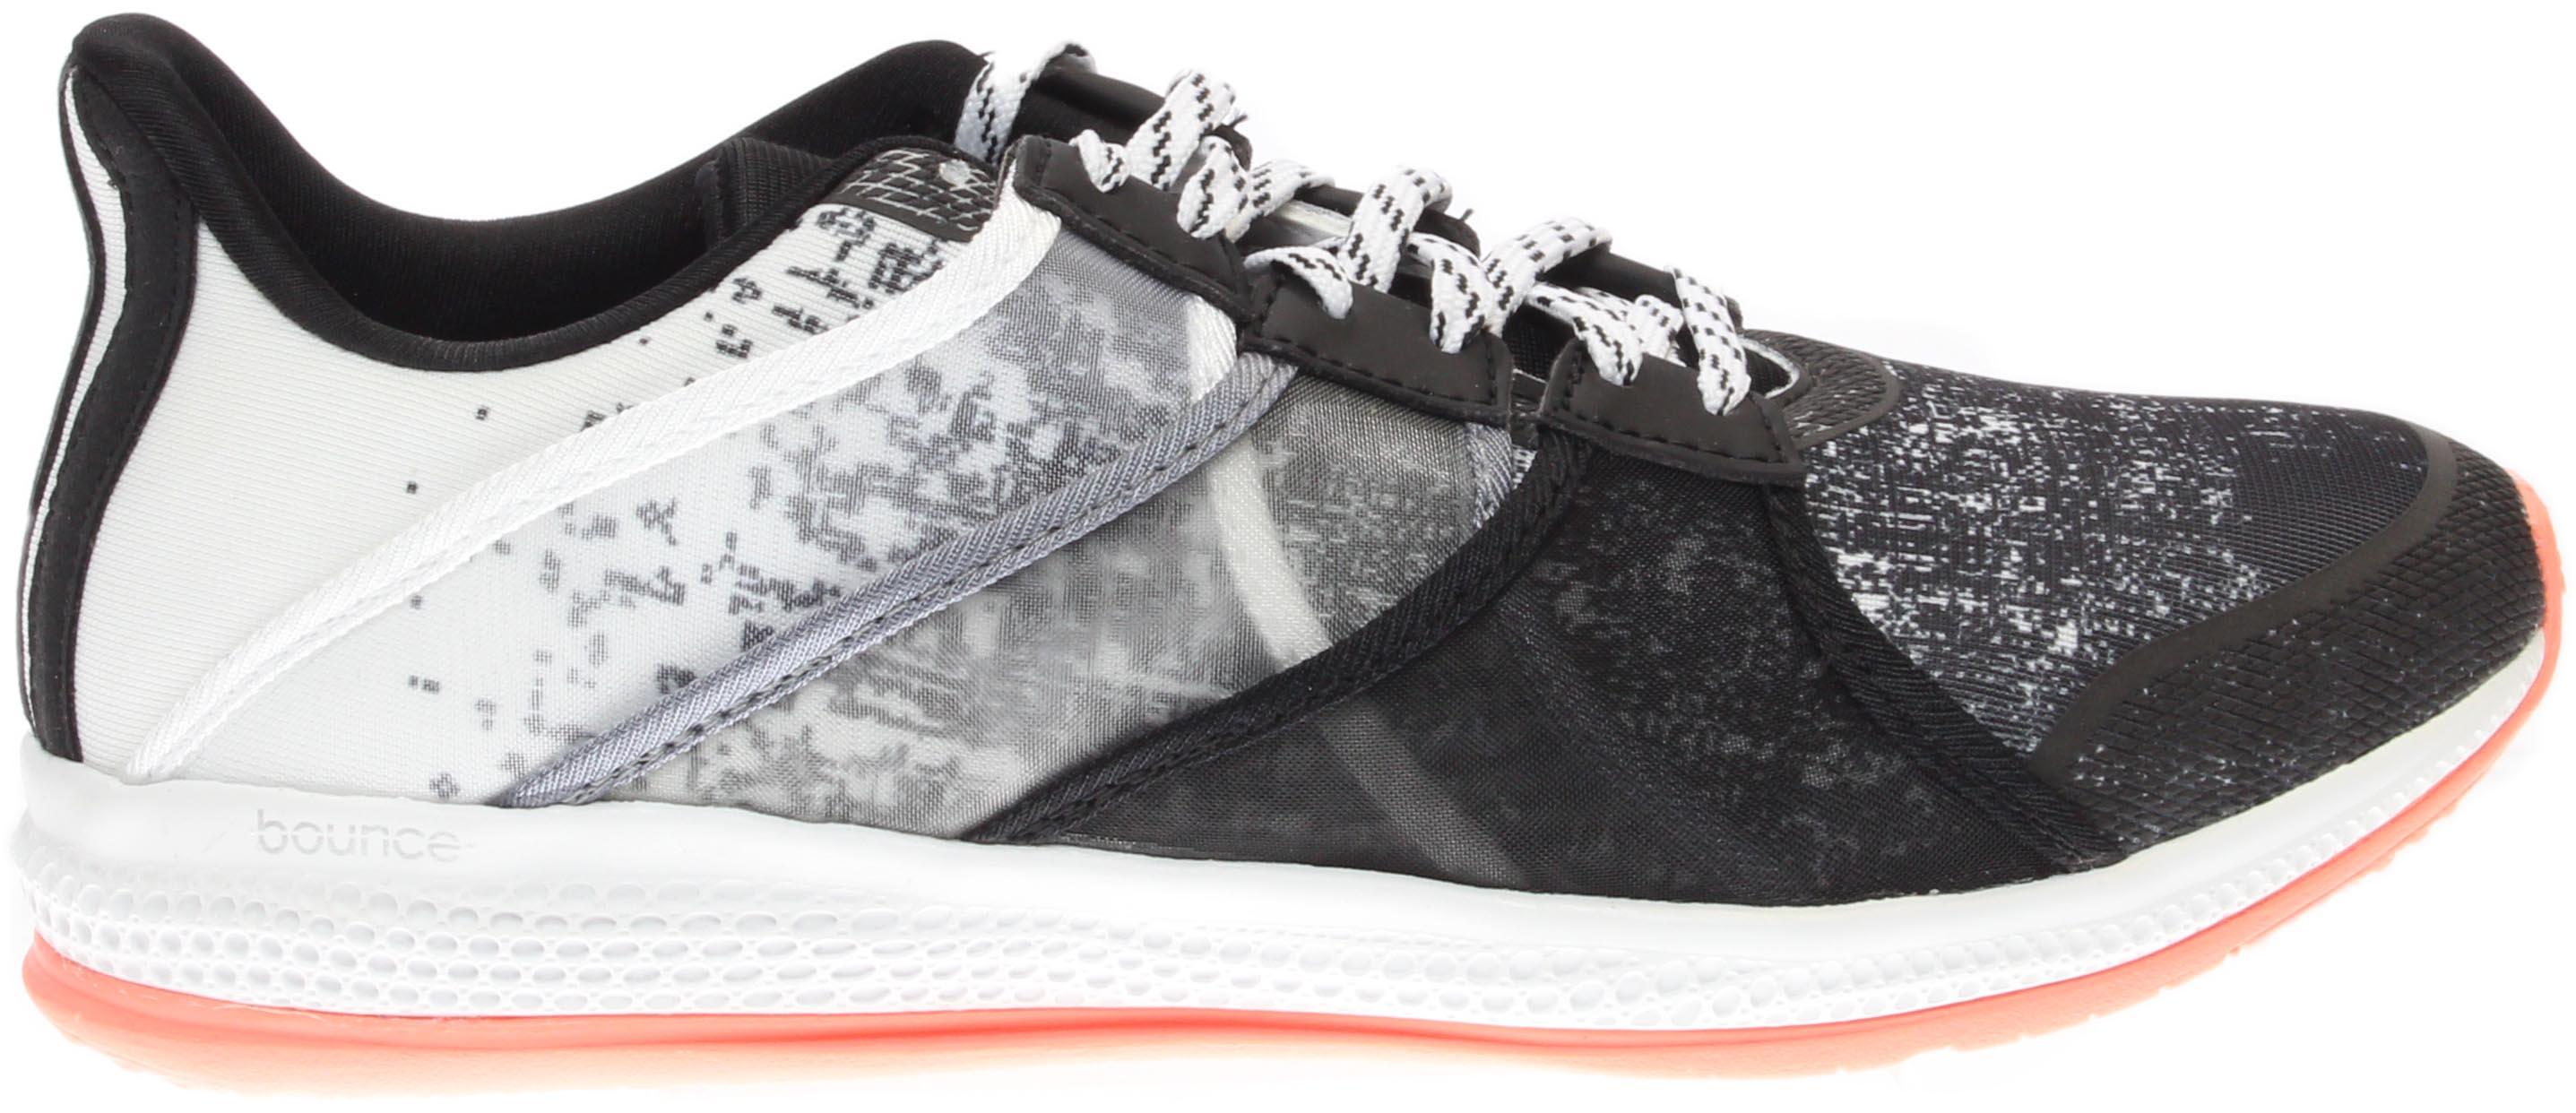 adidas Gymbreaker Bounce Black;White - Womens  - Size 5.5